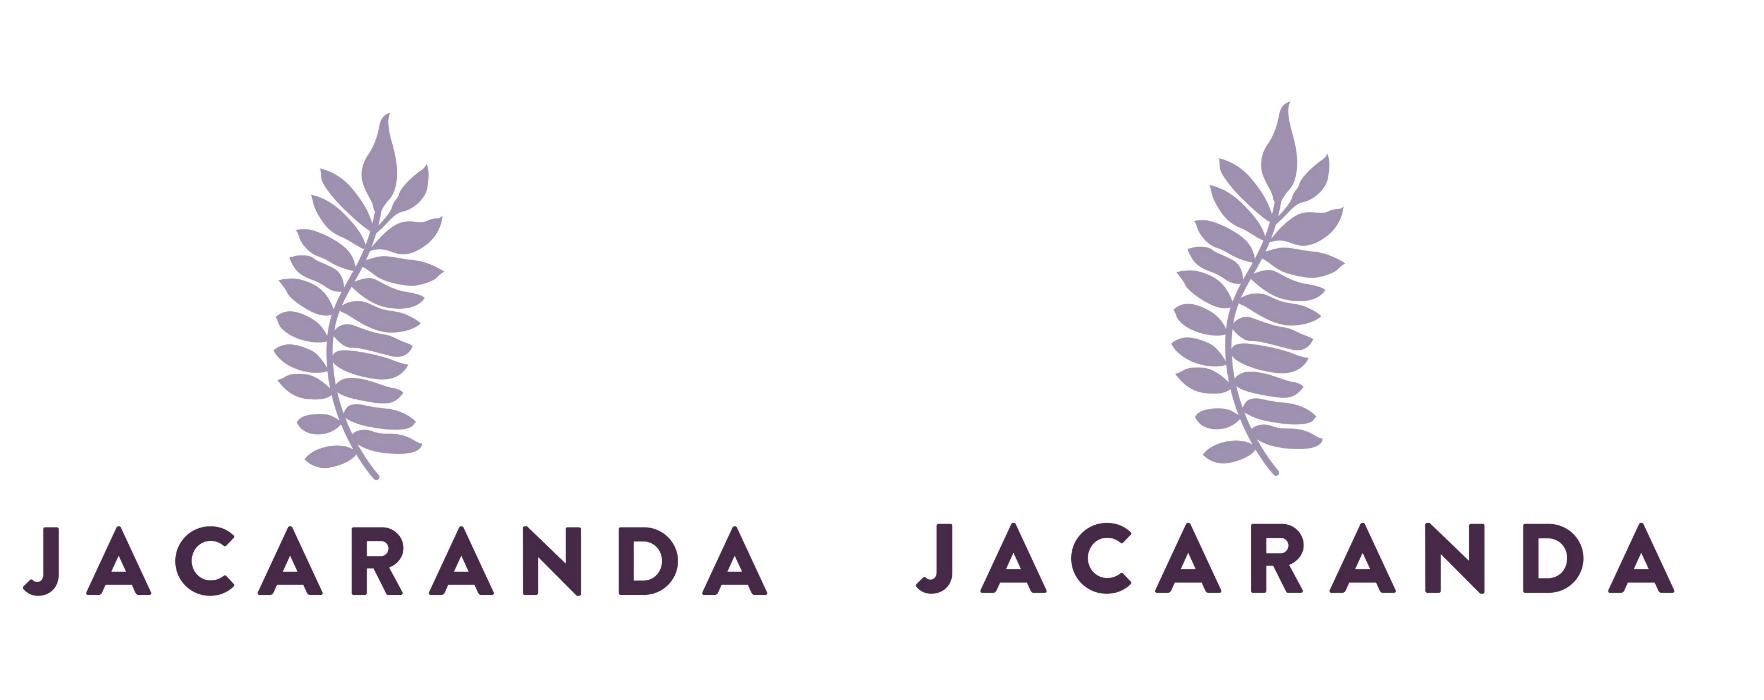 Article image - Jacaranda logo